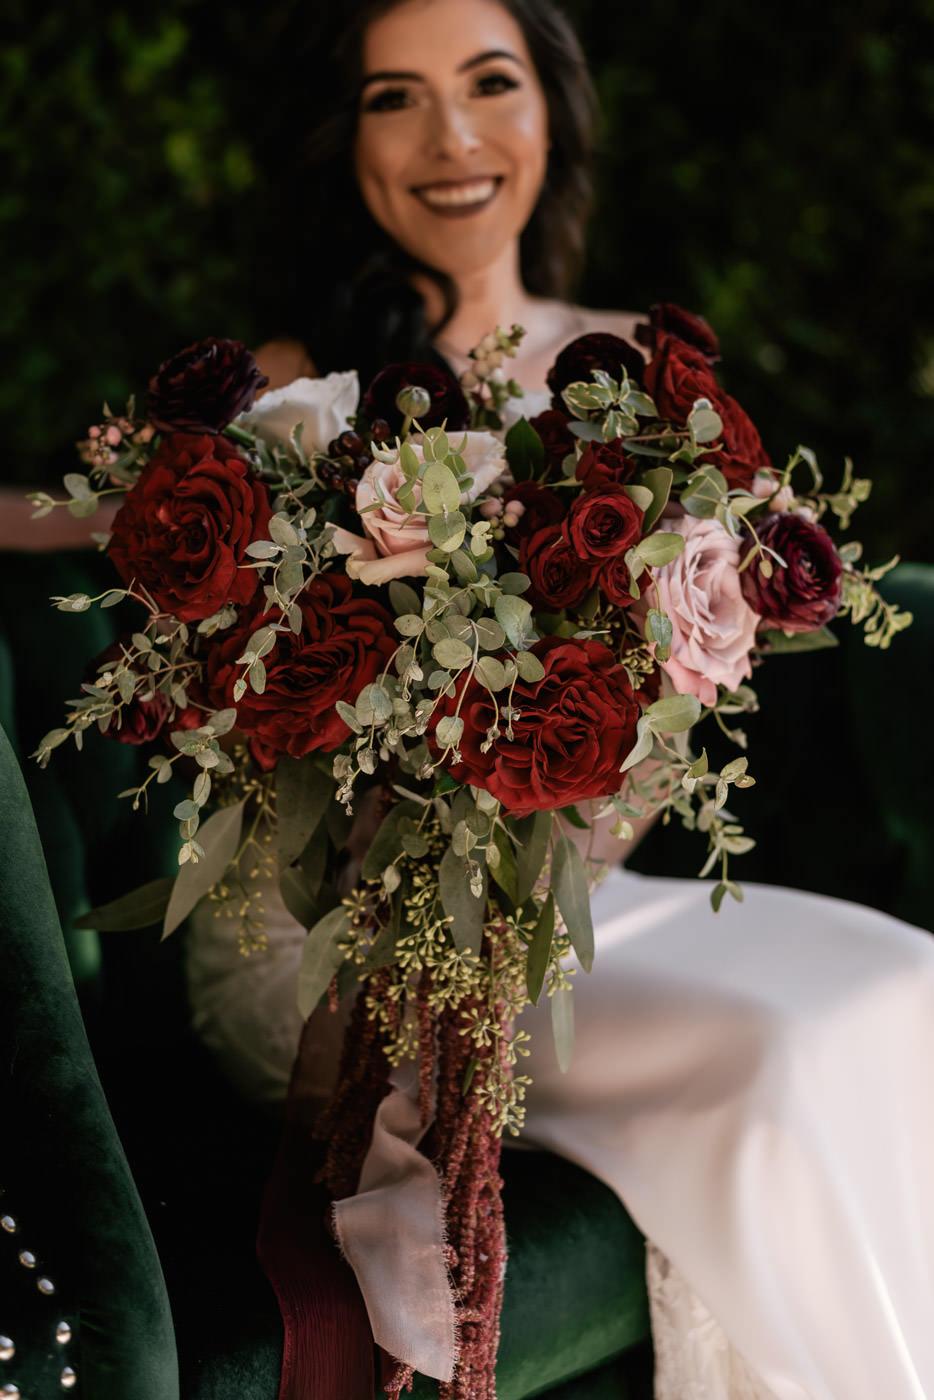 eden-gardens-wedding-photographer-romantic-15.jpg